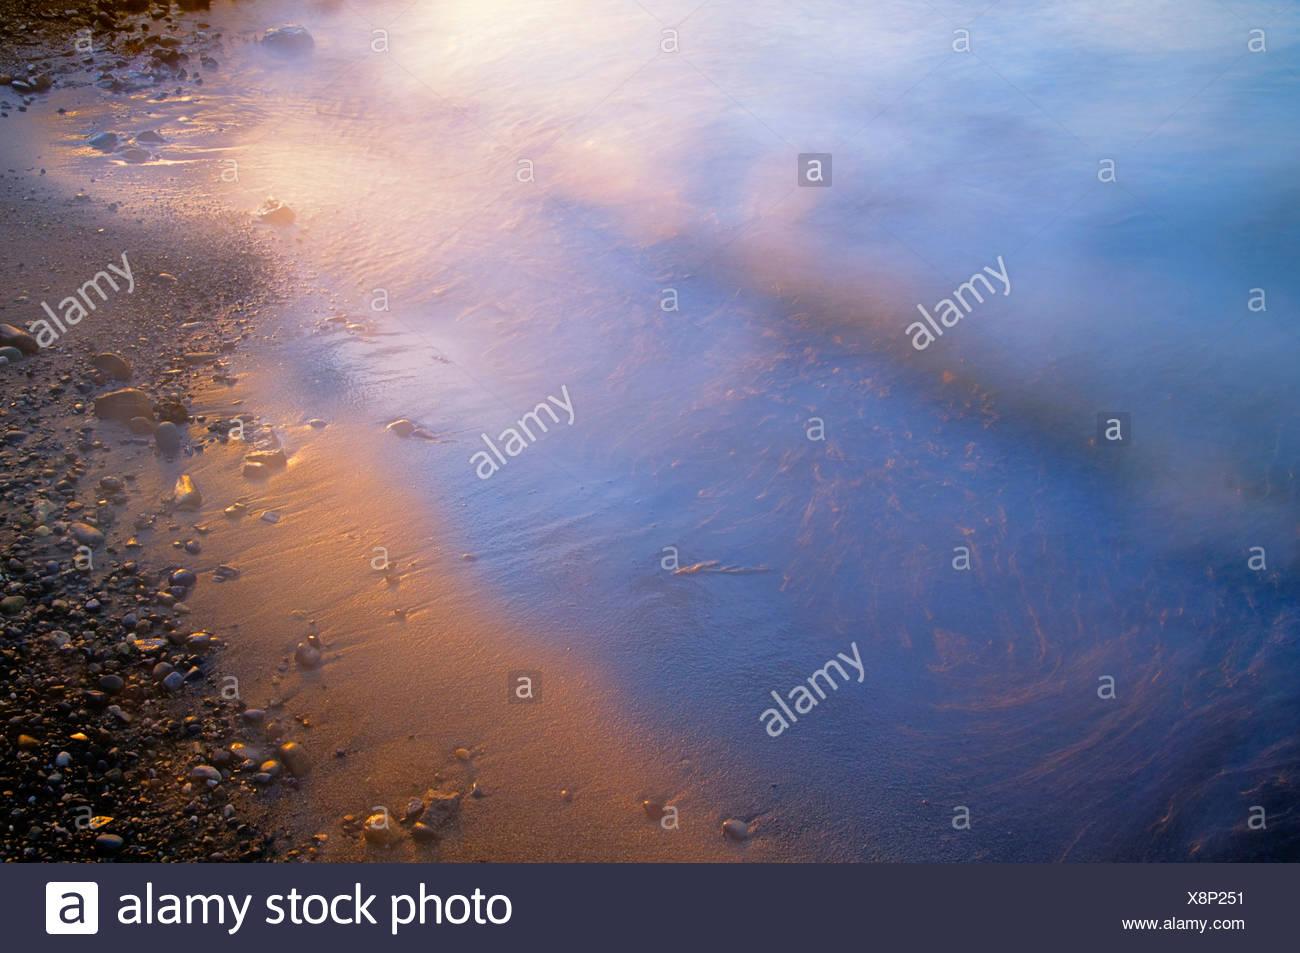 Germany, Baden-Württemberg, Hagnau, Lake Constance - Stock Image